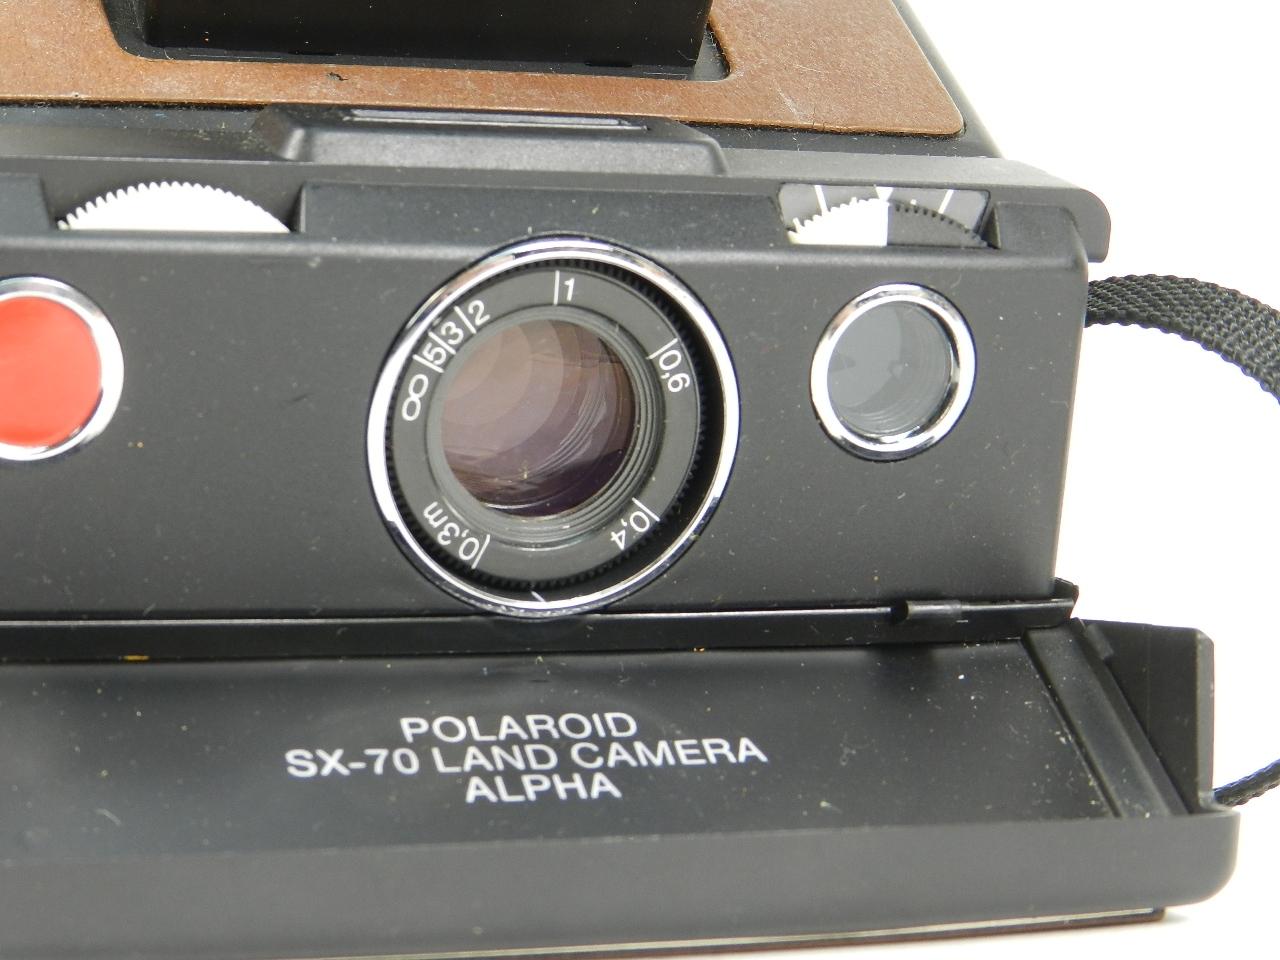 Imagen POLAROID SX-70 LAND CAMERA ALPHA 27775